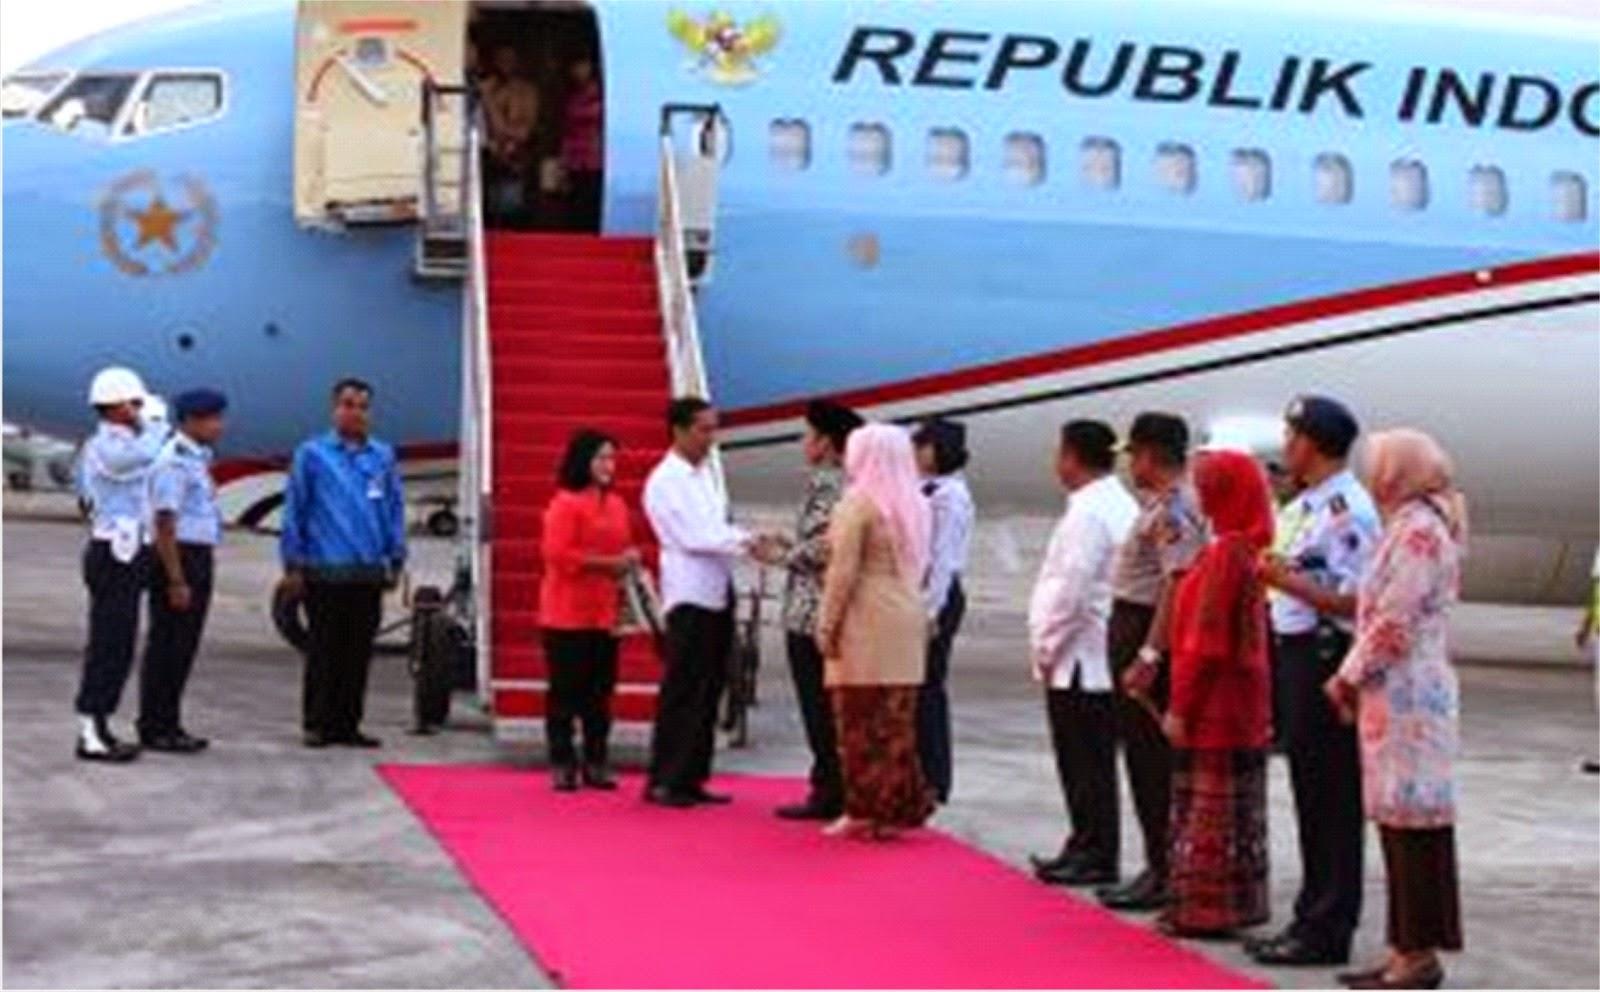 Gubernur Sambut Hangat  Kedatangan Presiden Jokowi di NTB